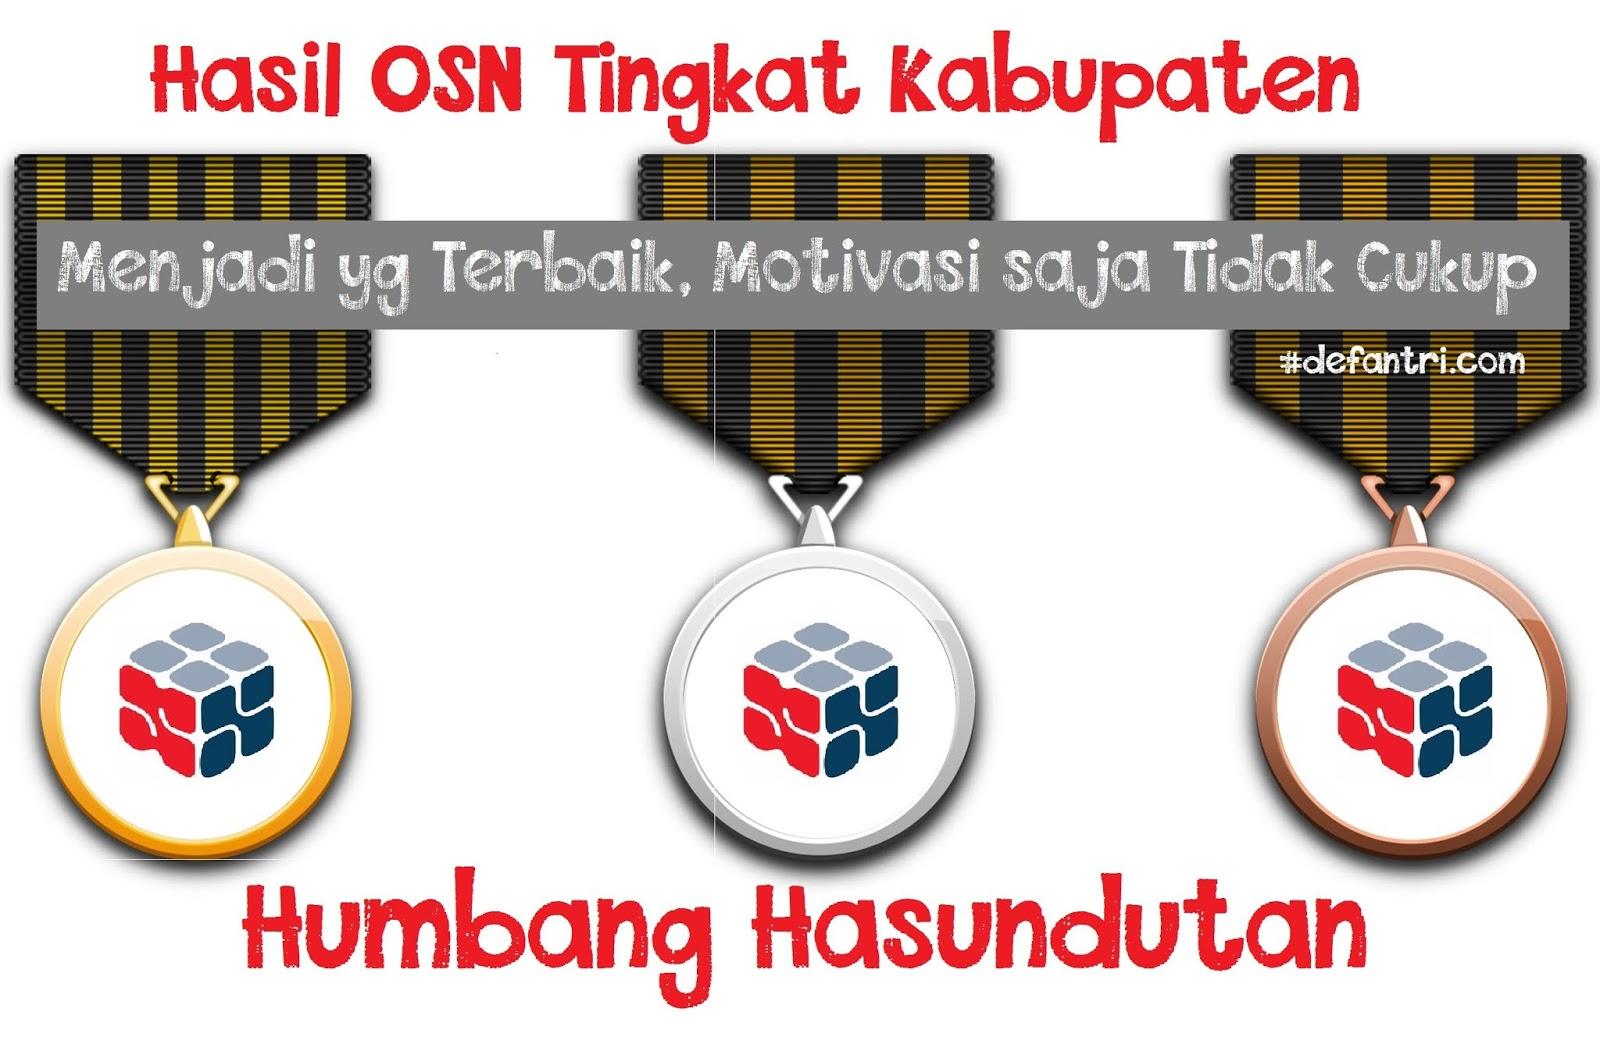 Hasil OSK Kabupaten Humbang Hasundutan 2019 (*Masih Menunggu)